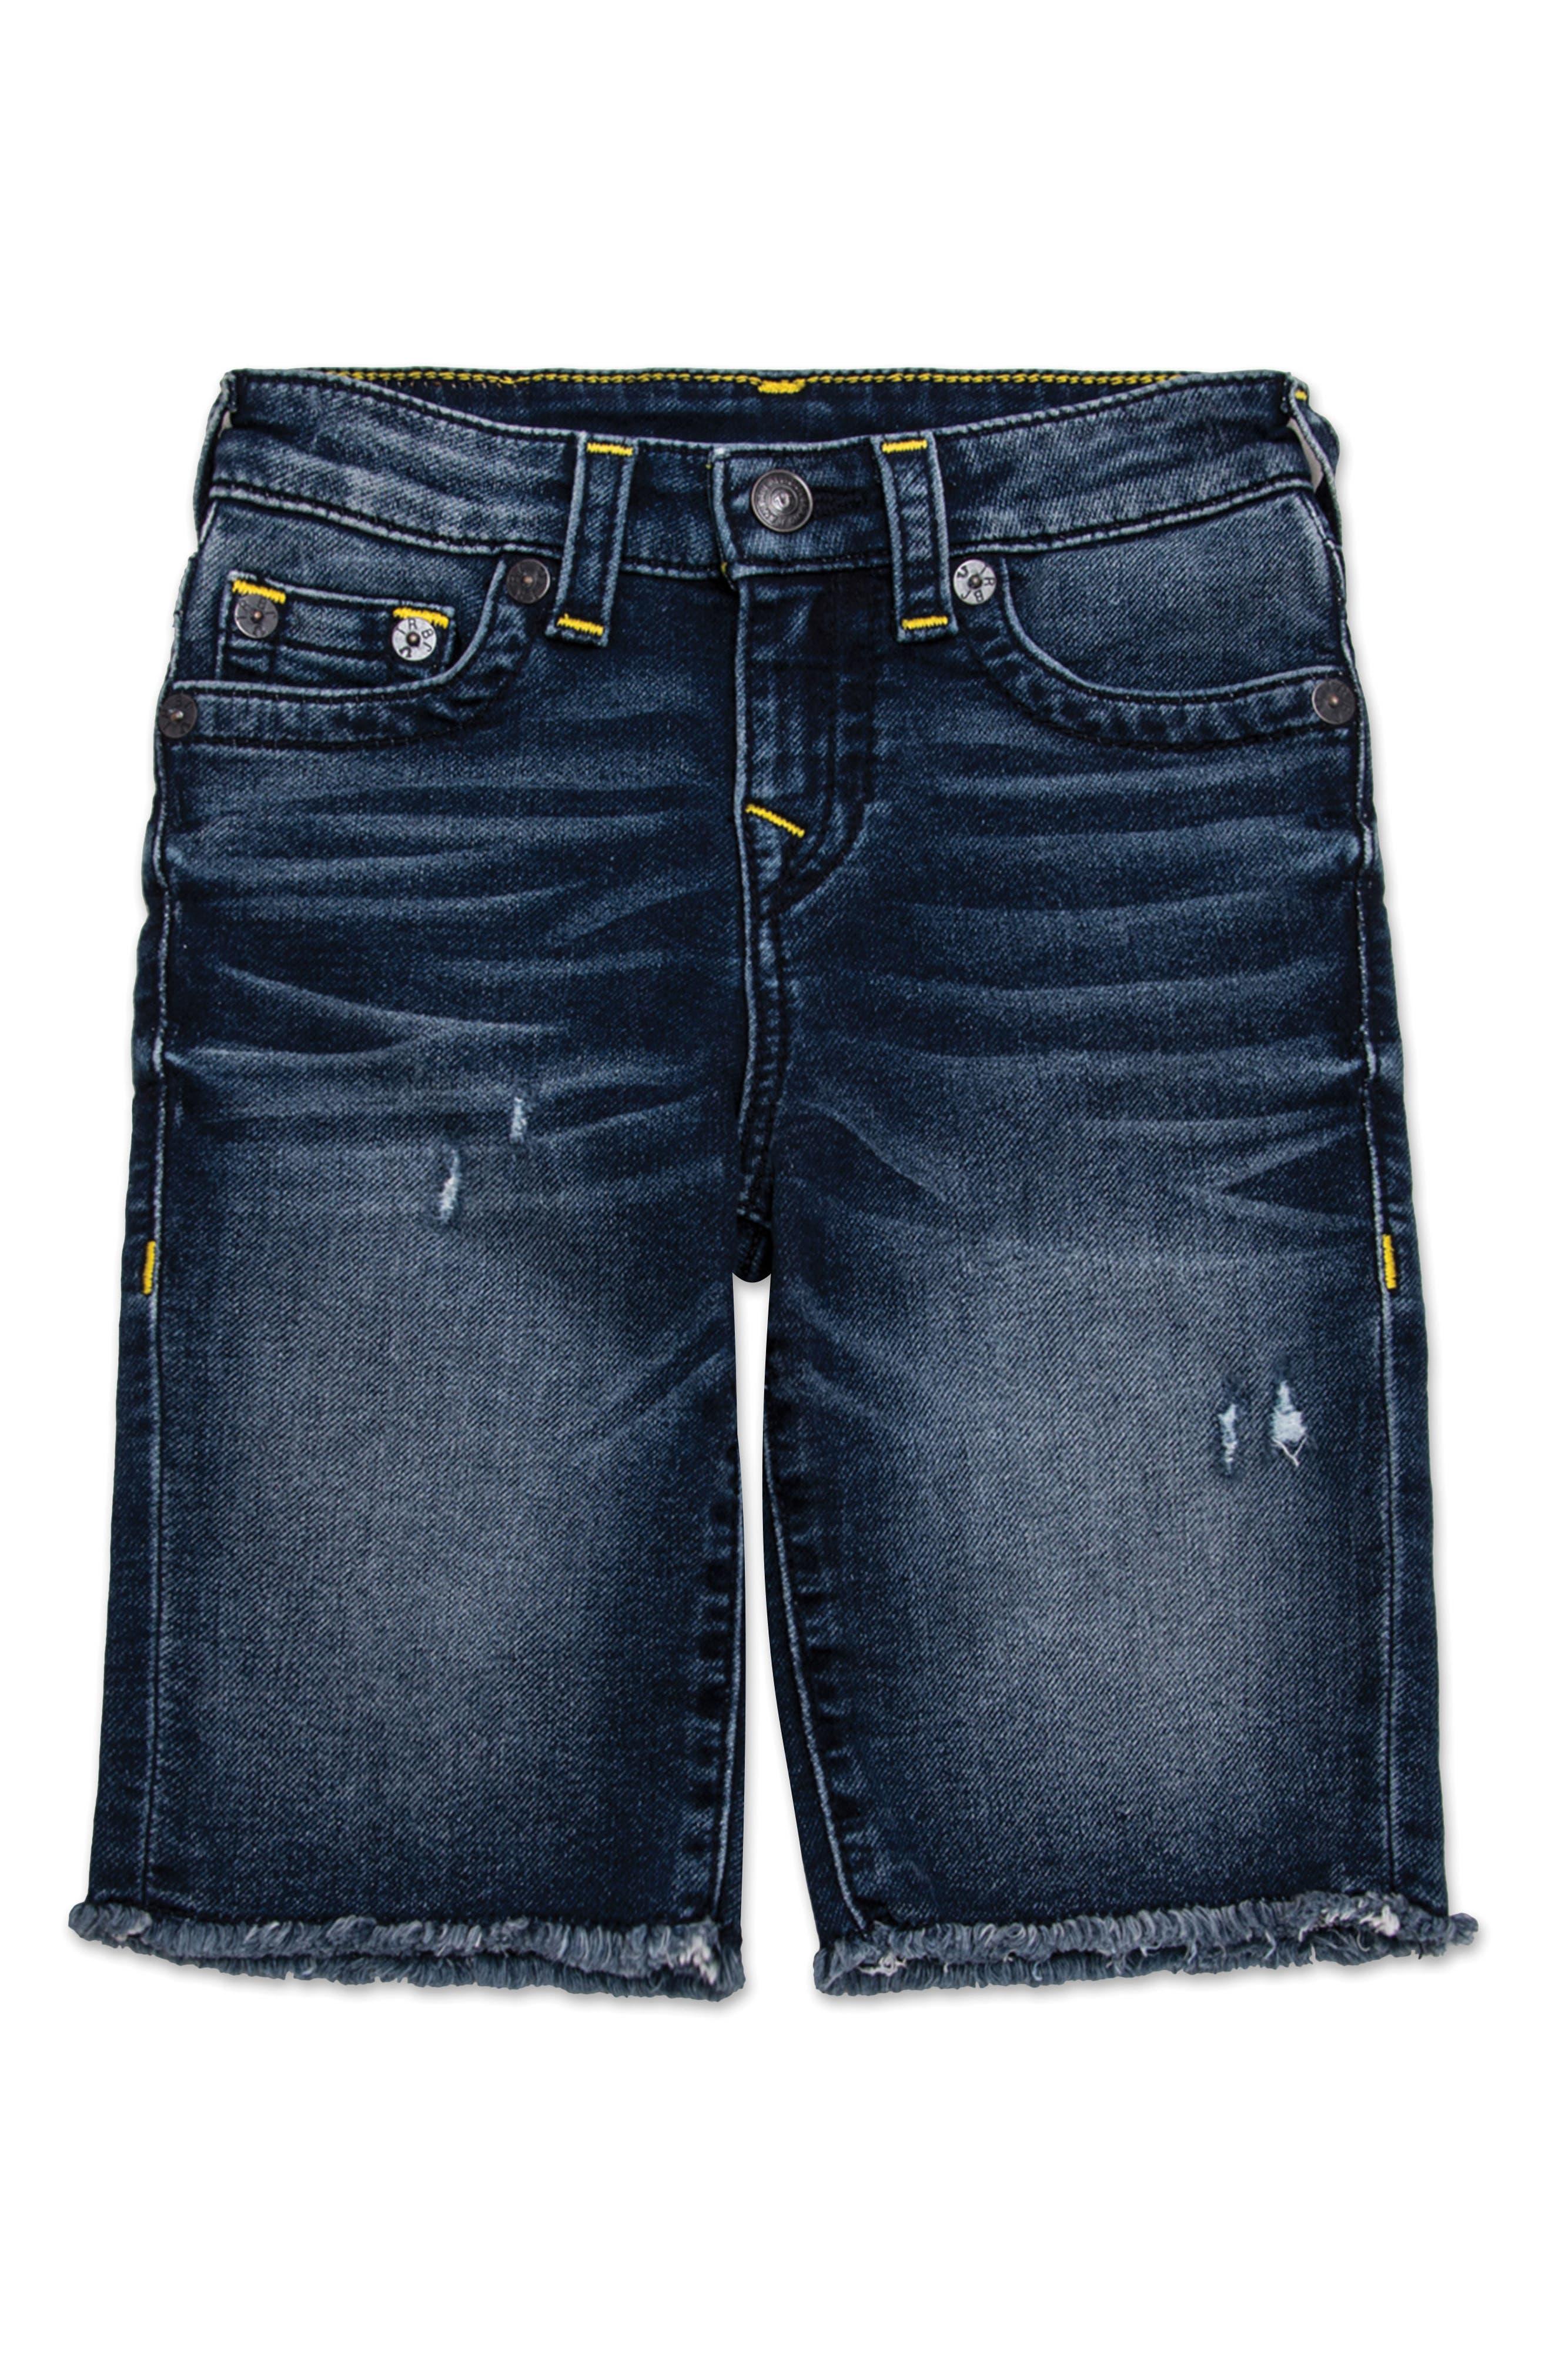 True Religion Brand Jeans Geno Cutoff Denim Shorts (Big Boys)